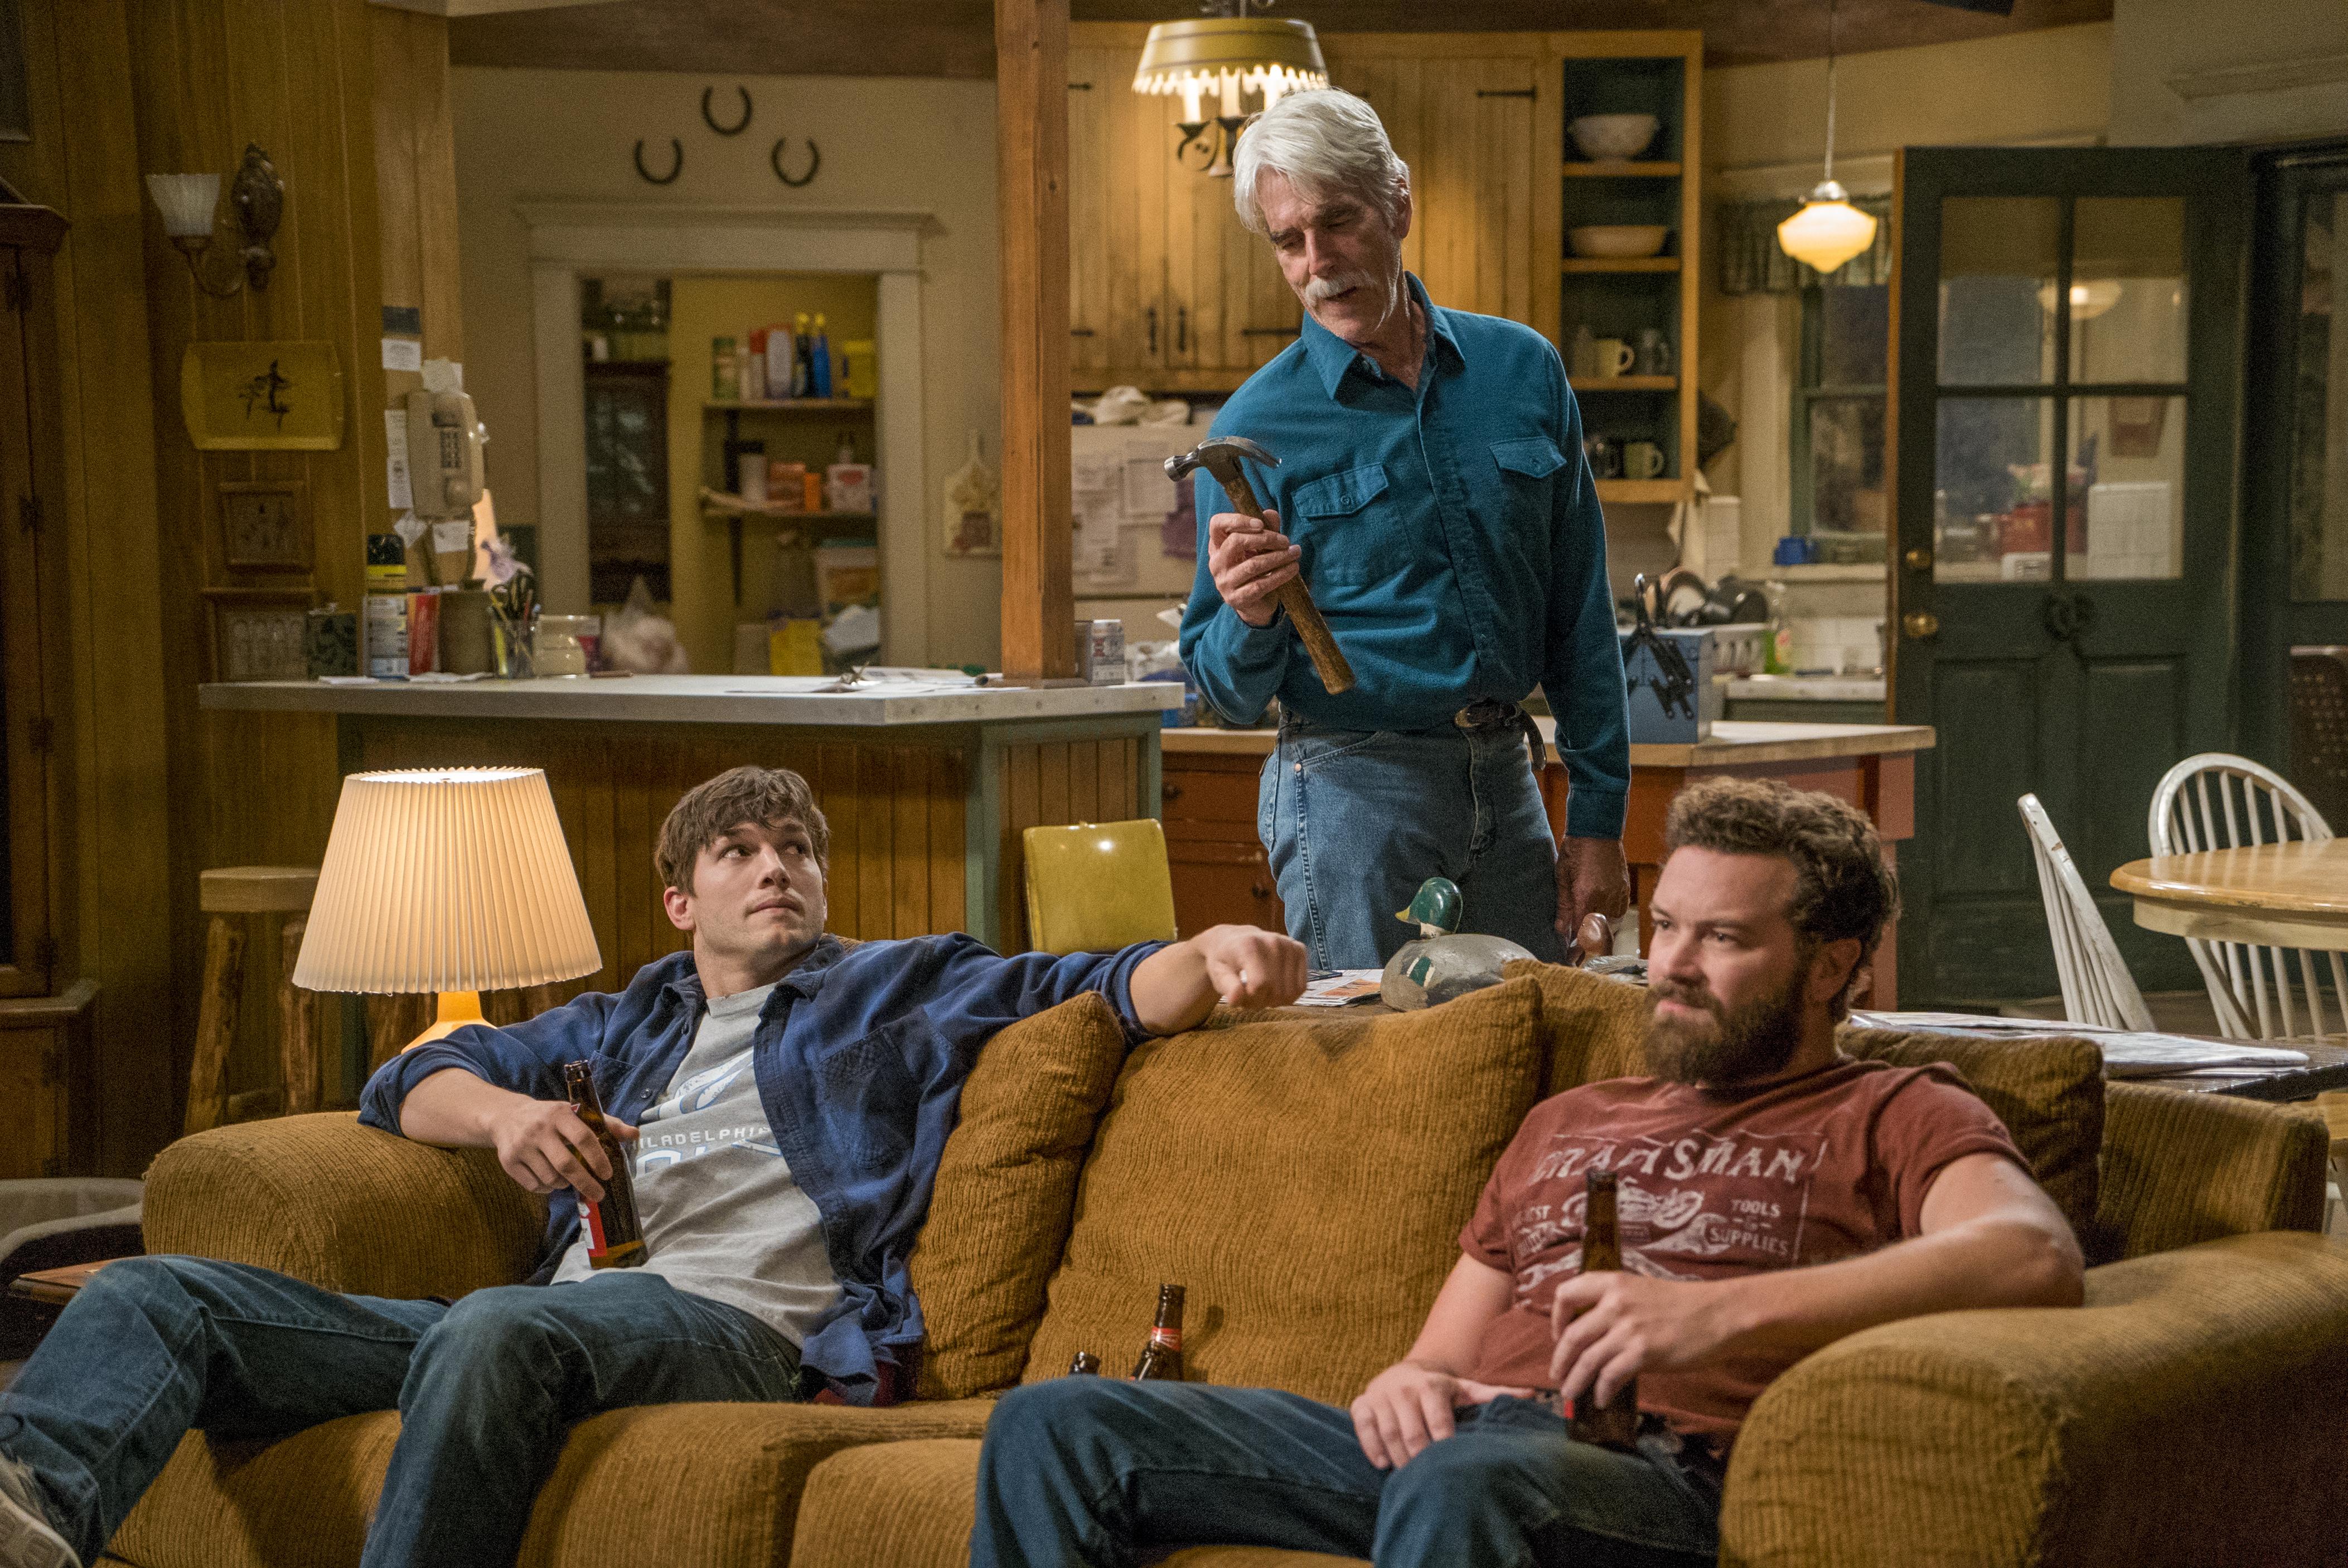 The Ranch: Got a Little Crazy   Season 1   Episode 4